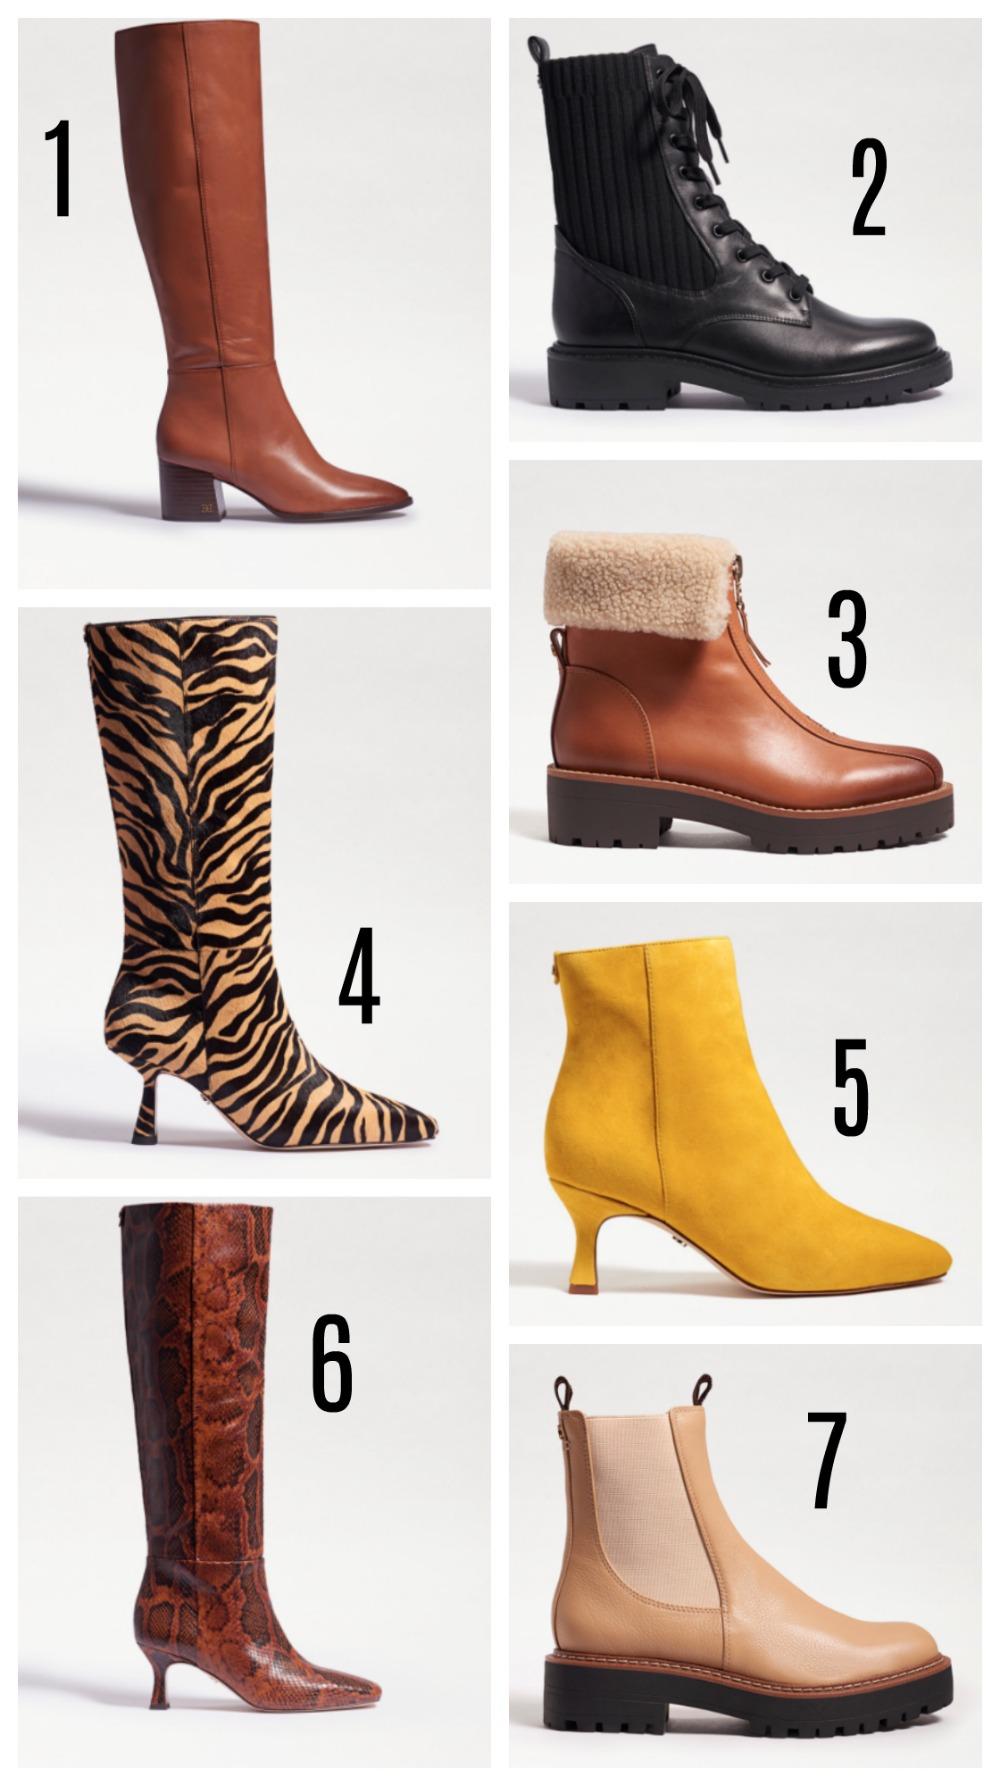 Sam Edelman Fall 2020 Boots Collection I Dreaminlace.com #fallfashion #boots #womensfashion